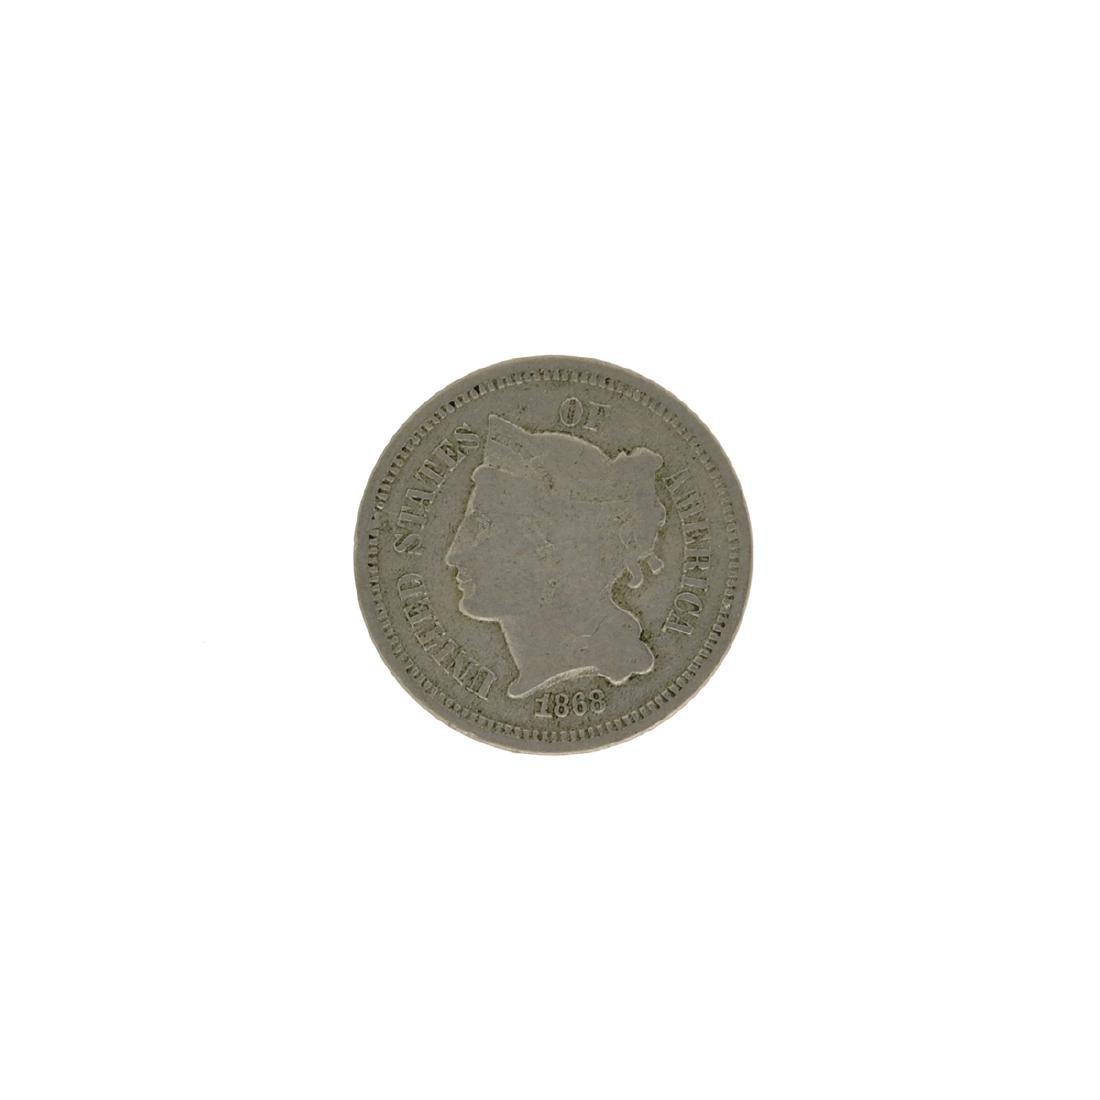 1868 Three Cent Coin